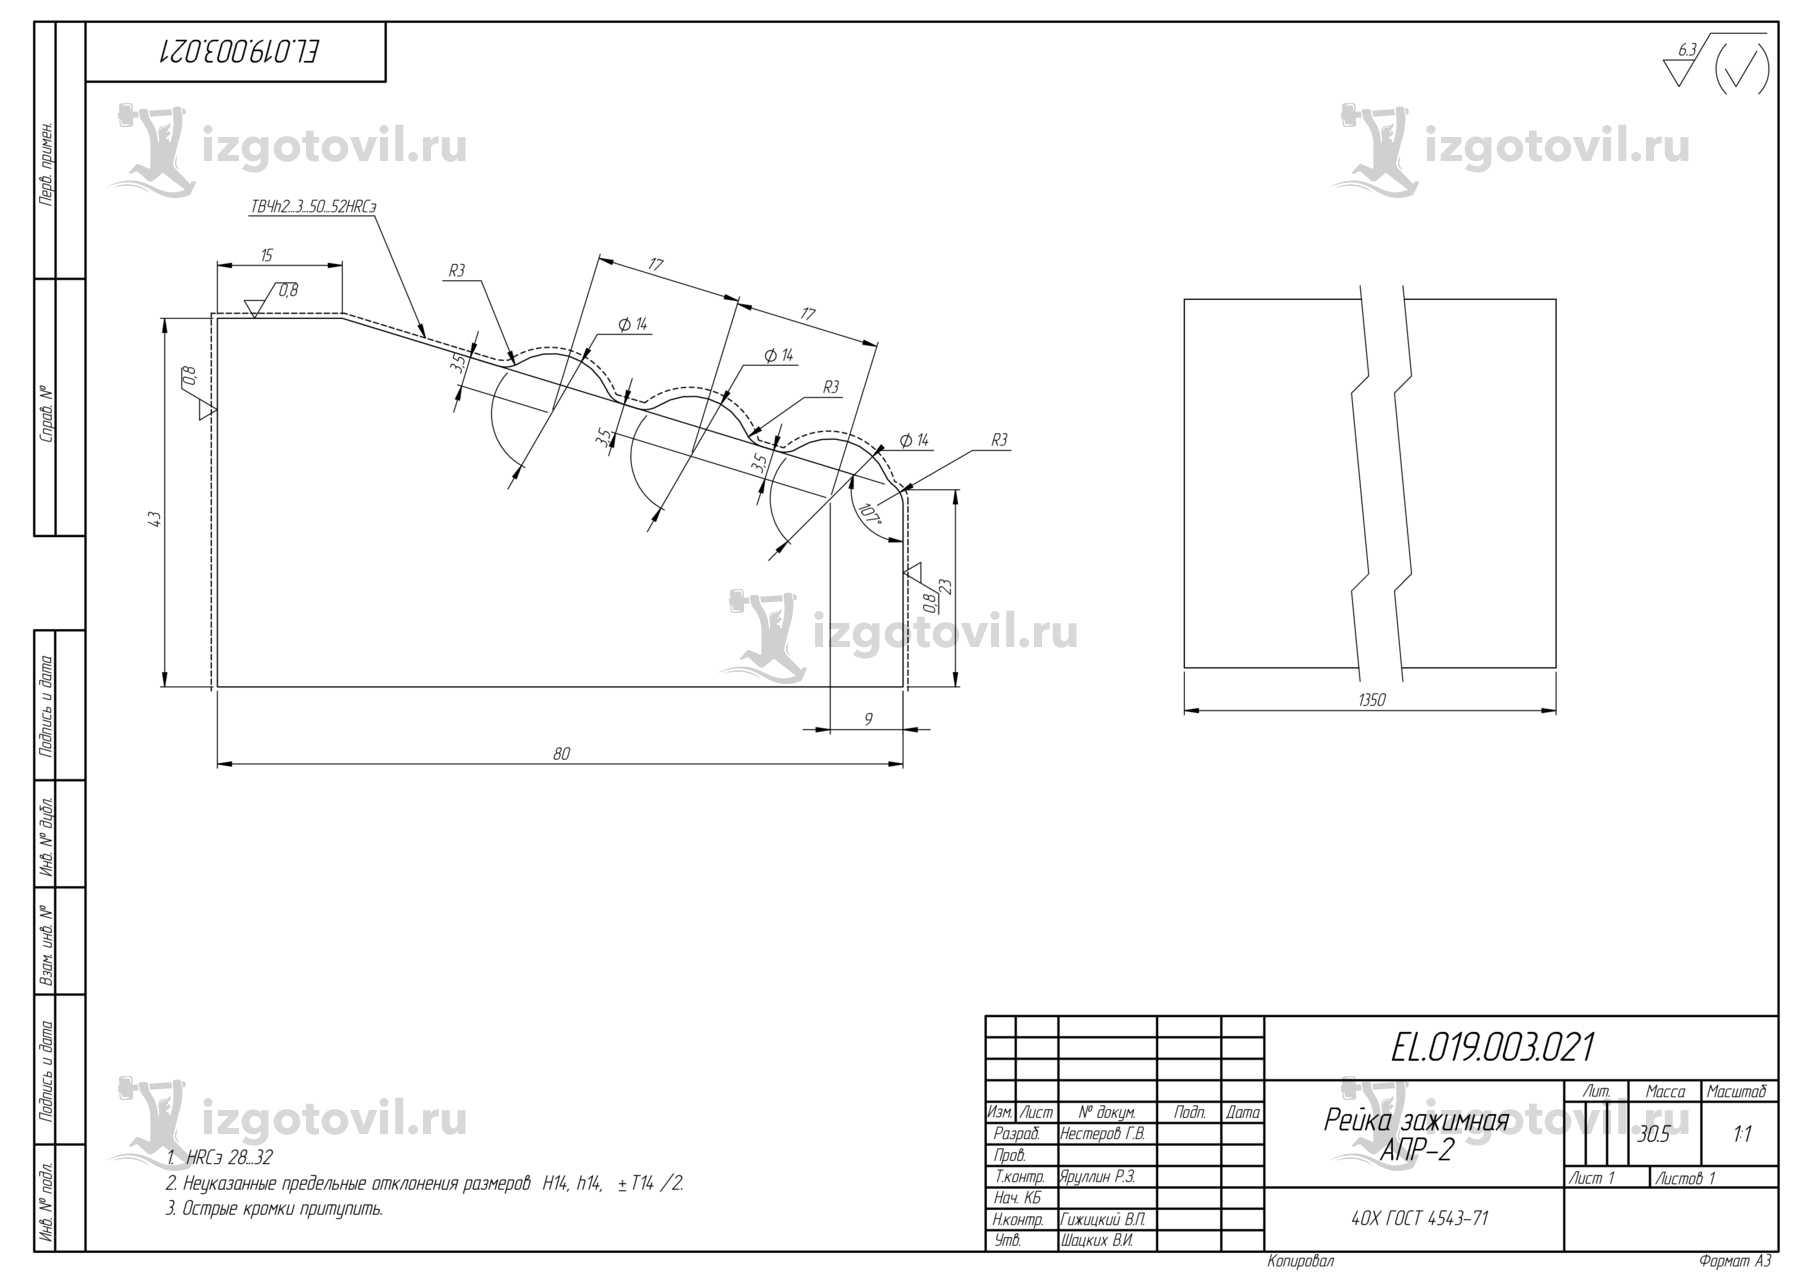 Изготовление деталей на заказ (детали)